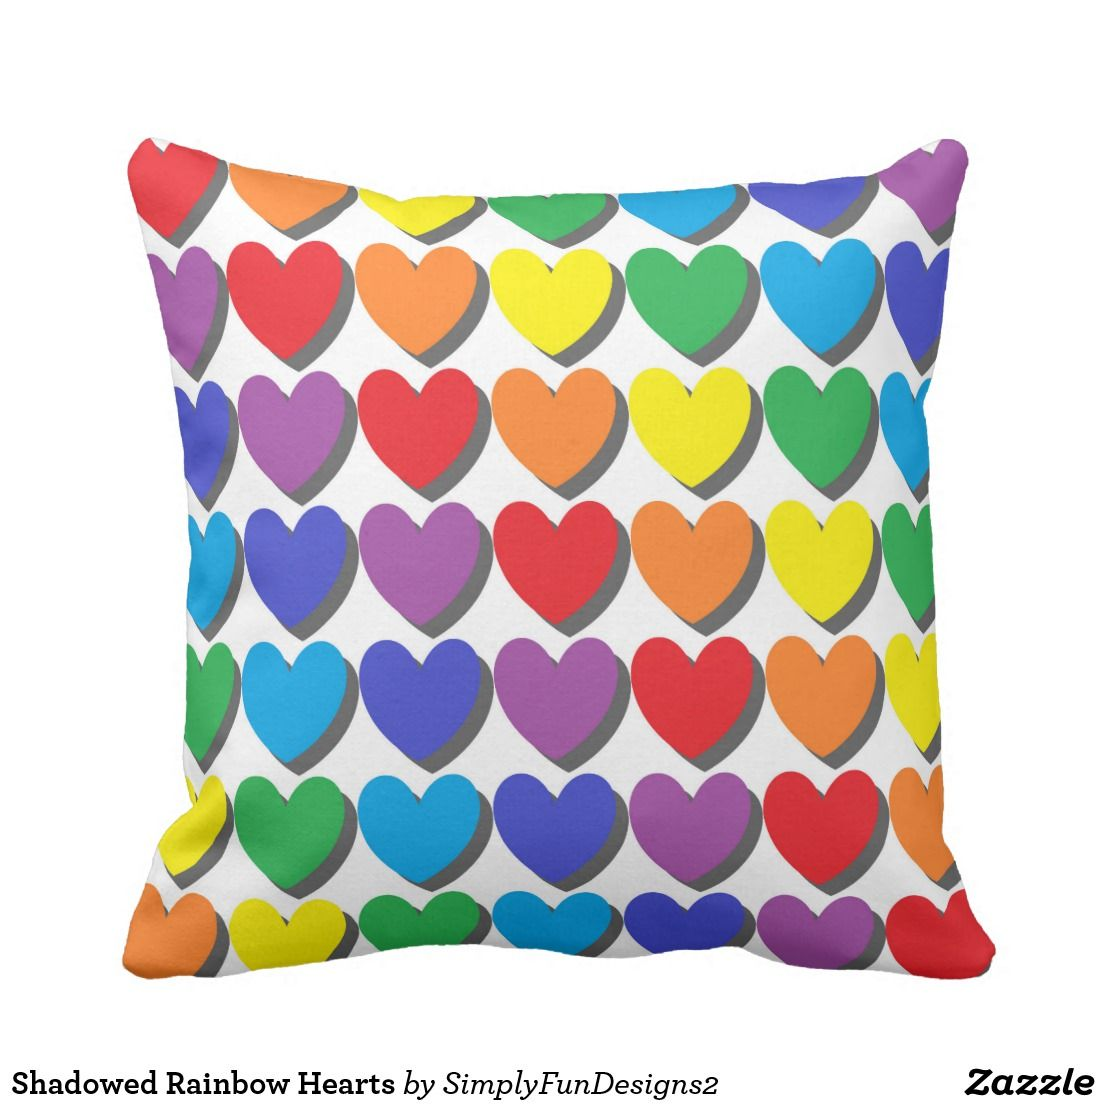 Shadowed Rainbow Hearts Throw Pillow Pillow Throwpillow Decorative Homedecor Interiordesign Throw Pillow Pattern Decorative Throw Pillows Pillows